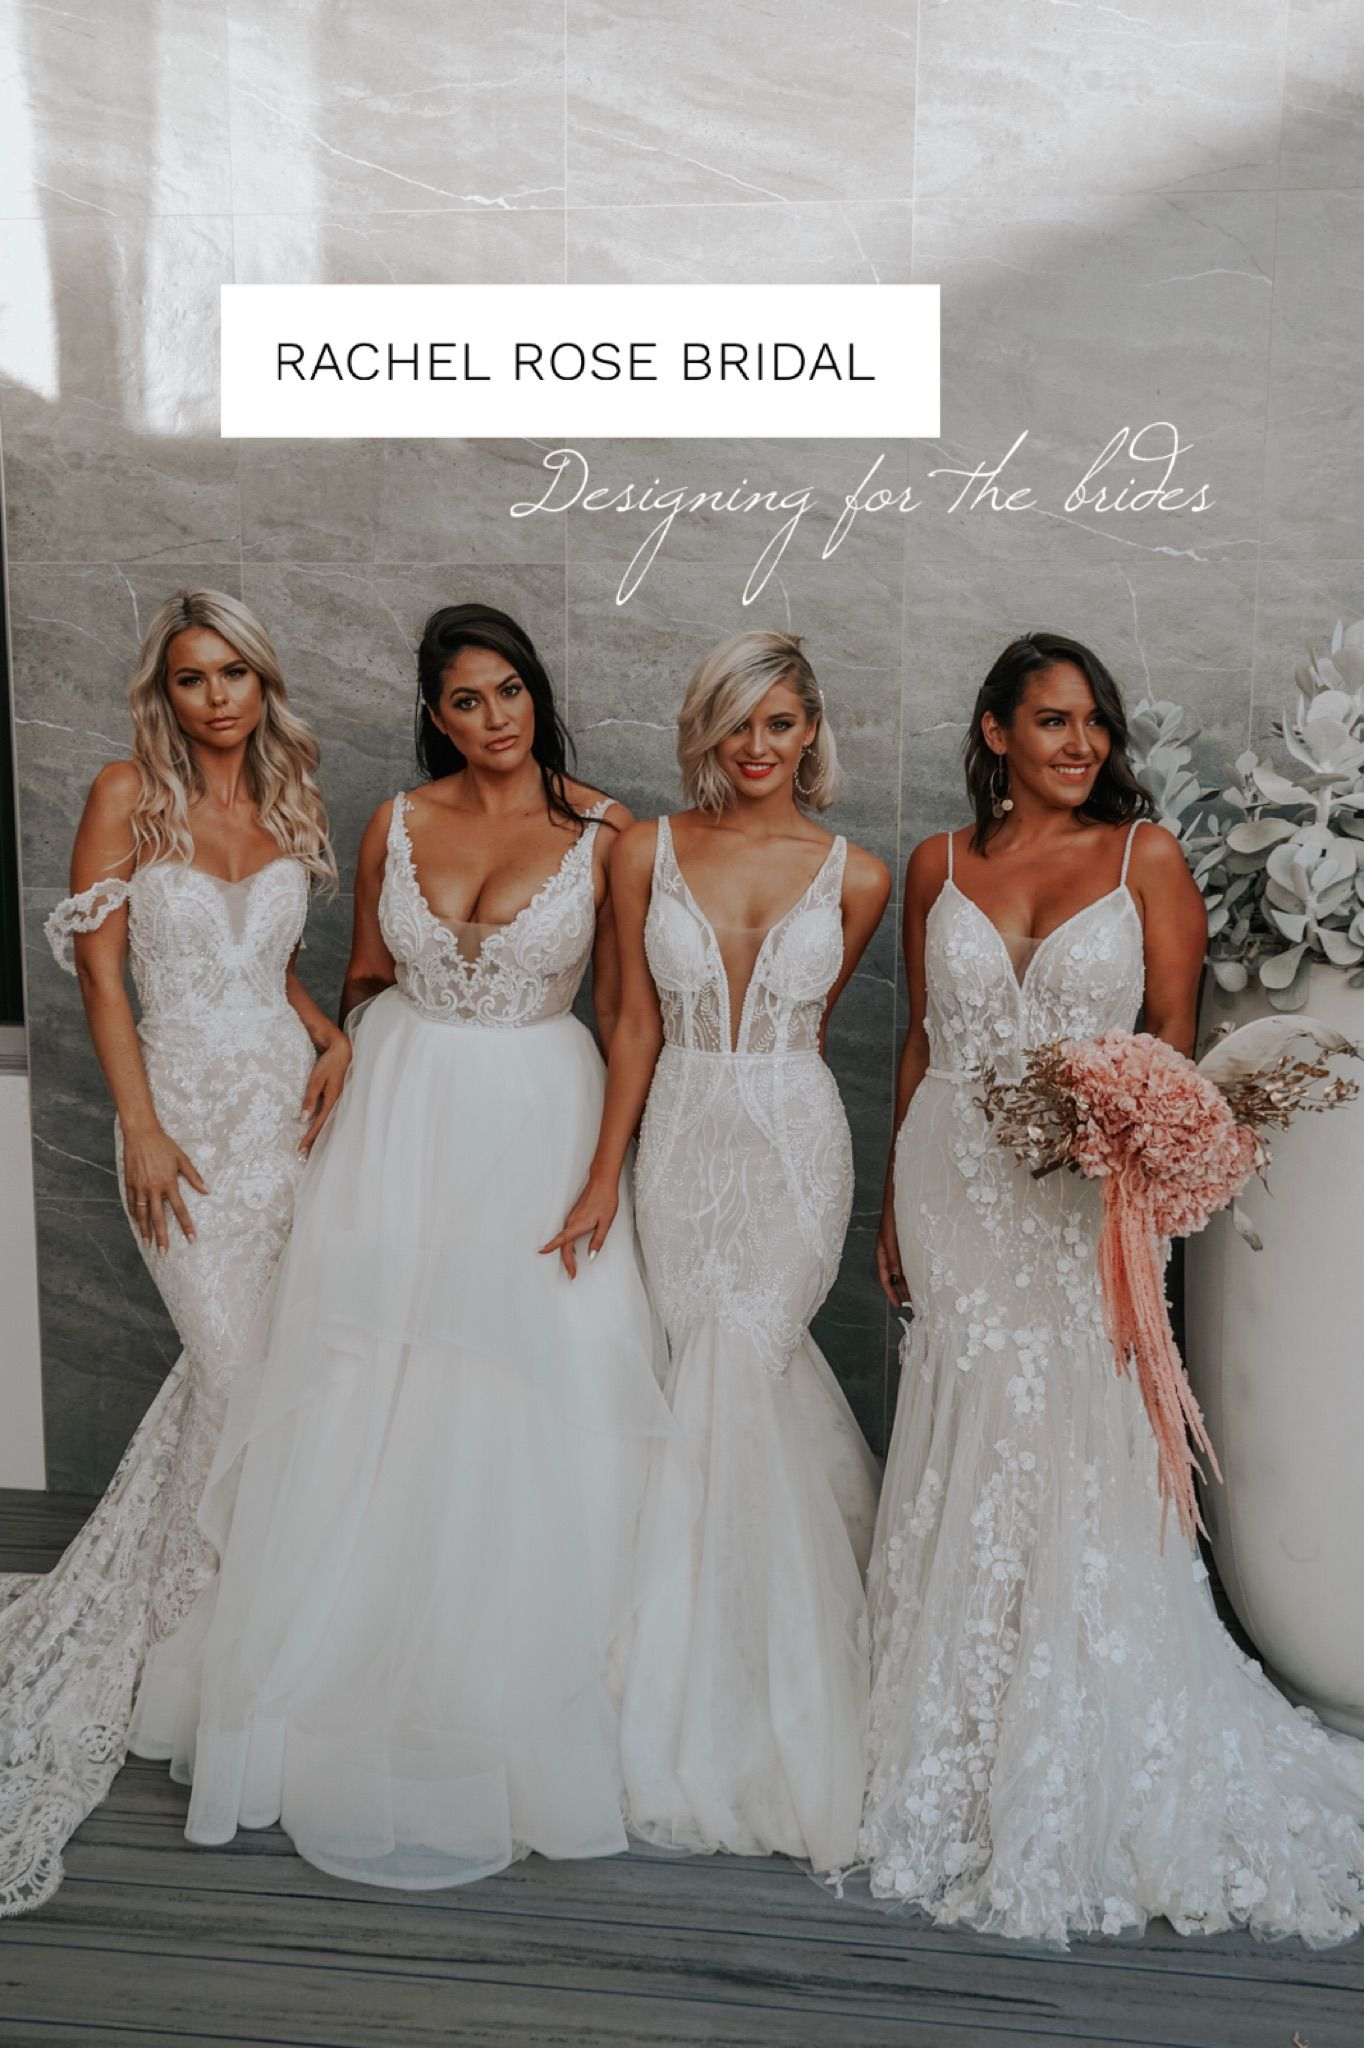 Bridesmaid Bridal Dress Shop Petite Wedding Dress Bridal Looks Modest Wedding Gowns